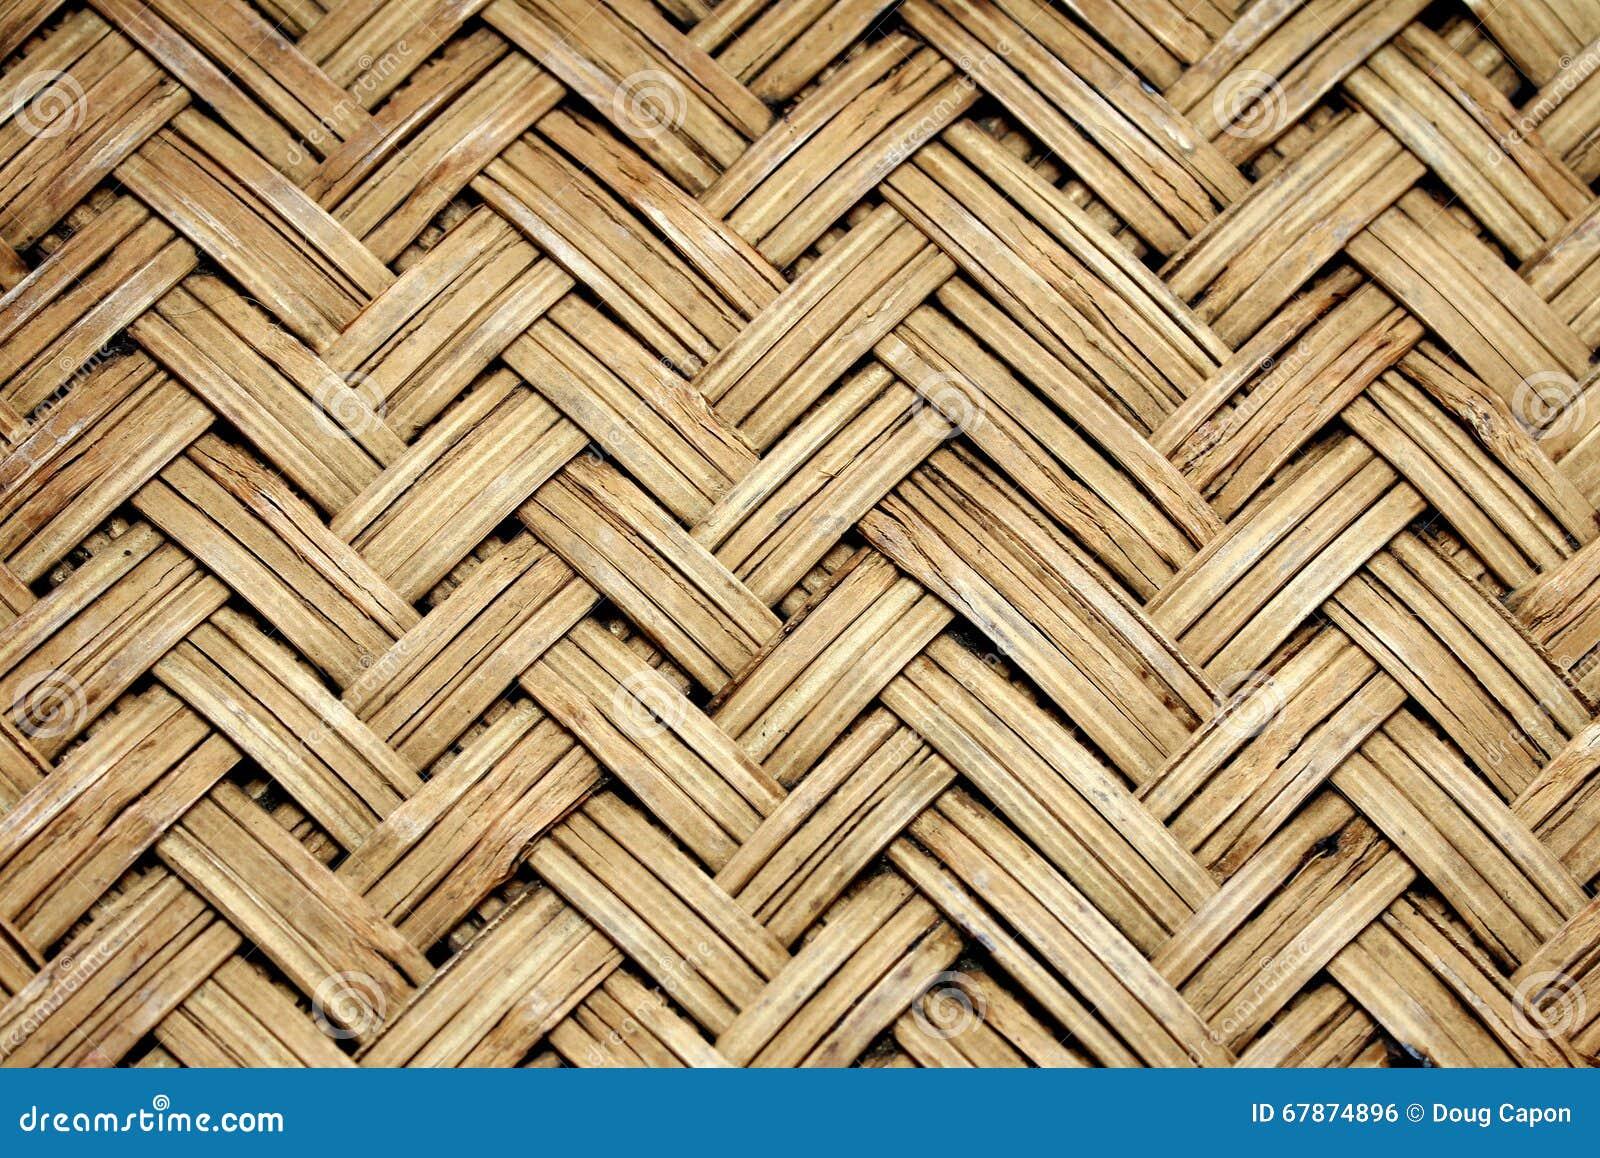 basket weave Crochet mini basket weave stitch tutorial - duration: 9:20 sewrella 159,957 views 9:20 how to crochet the basketweave stitch.